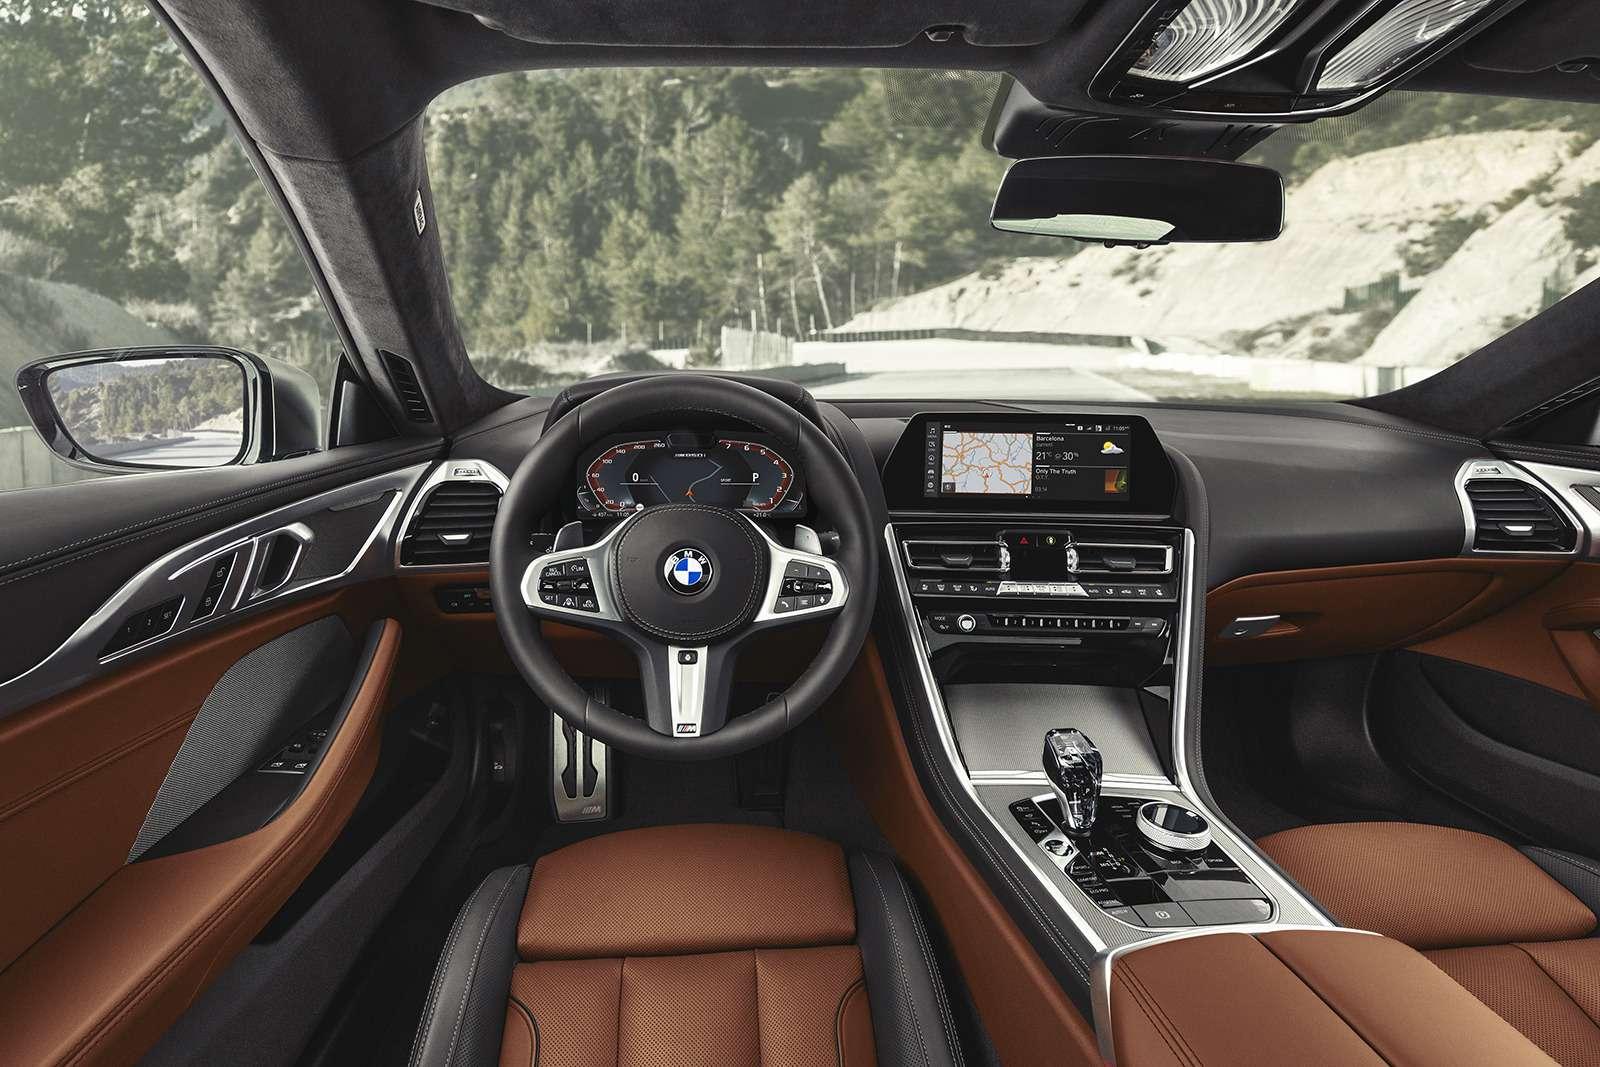 BMW8-й серии. 20лет спустя (почти)— фото 879670